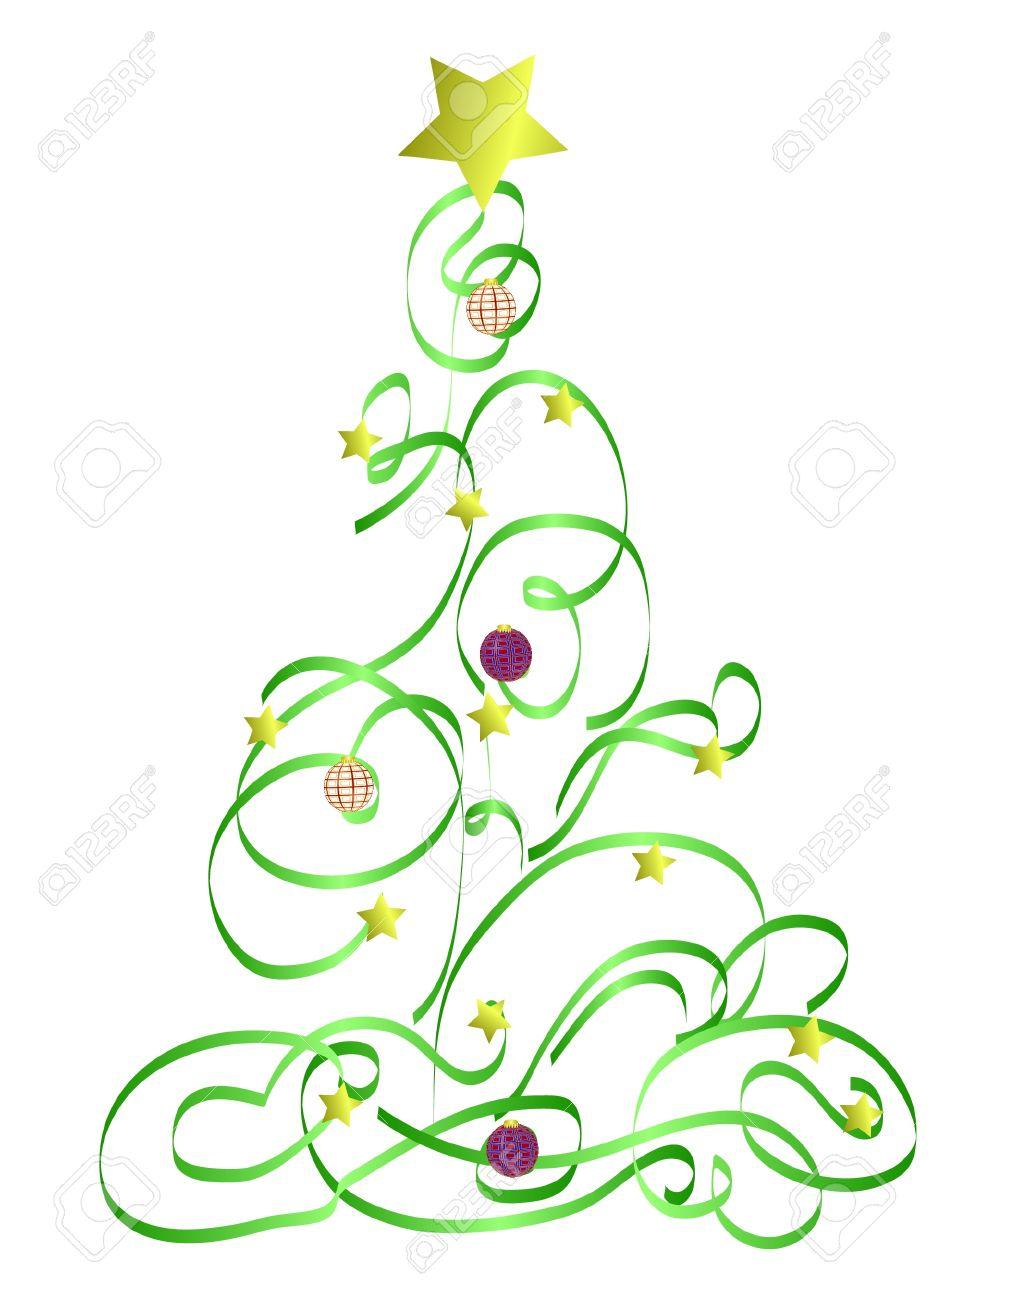 Abstract Christmas Tree Illustration Stock Vector - 14245209